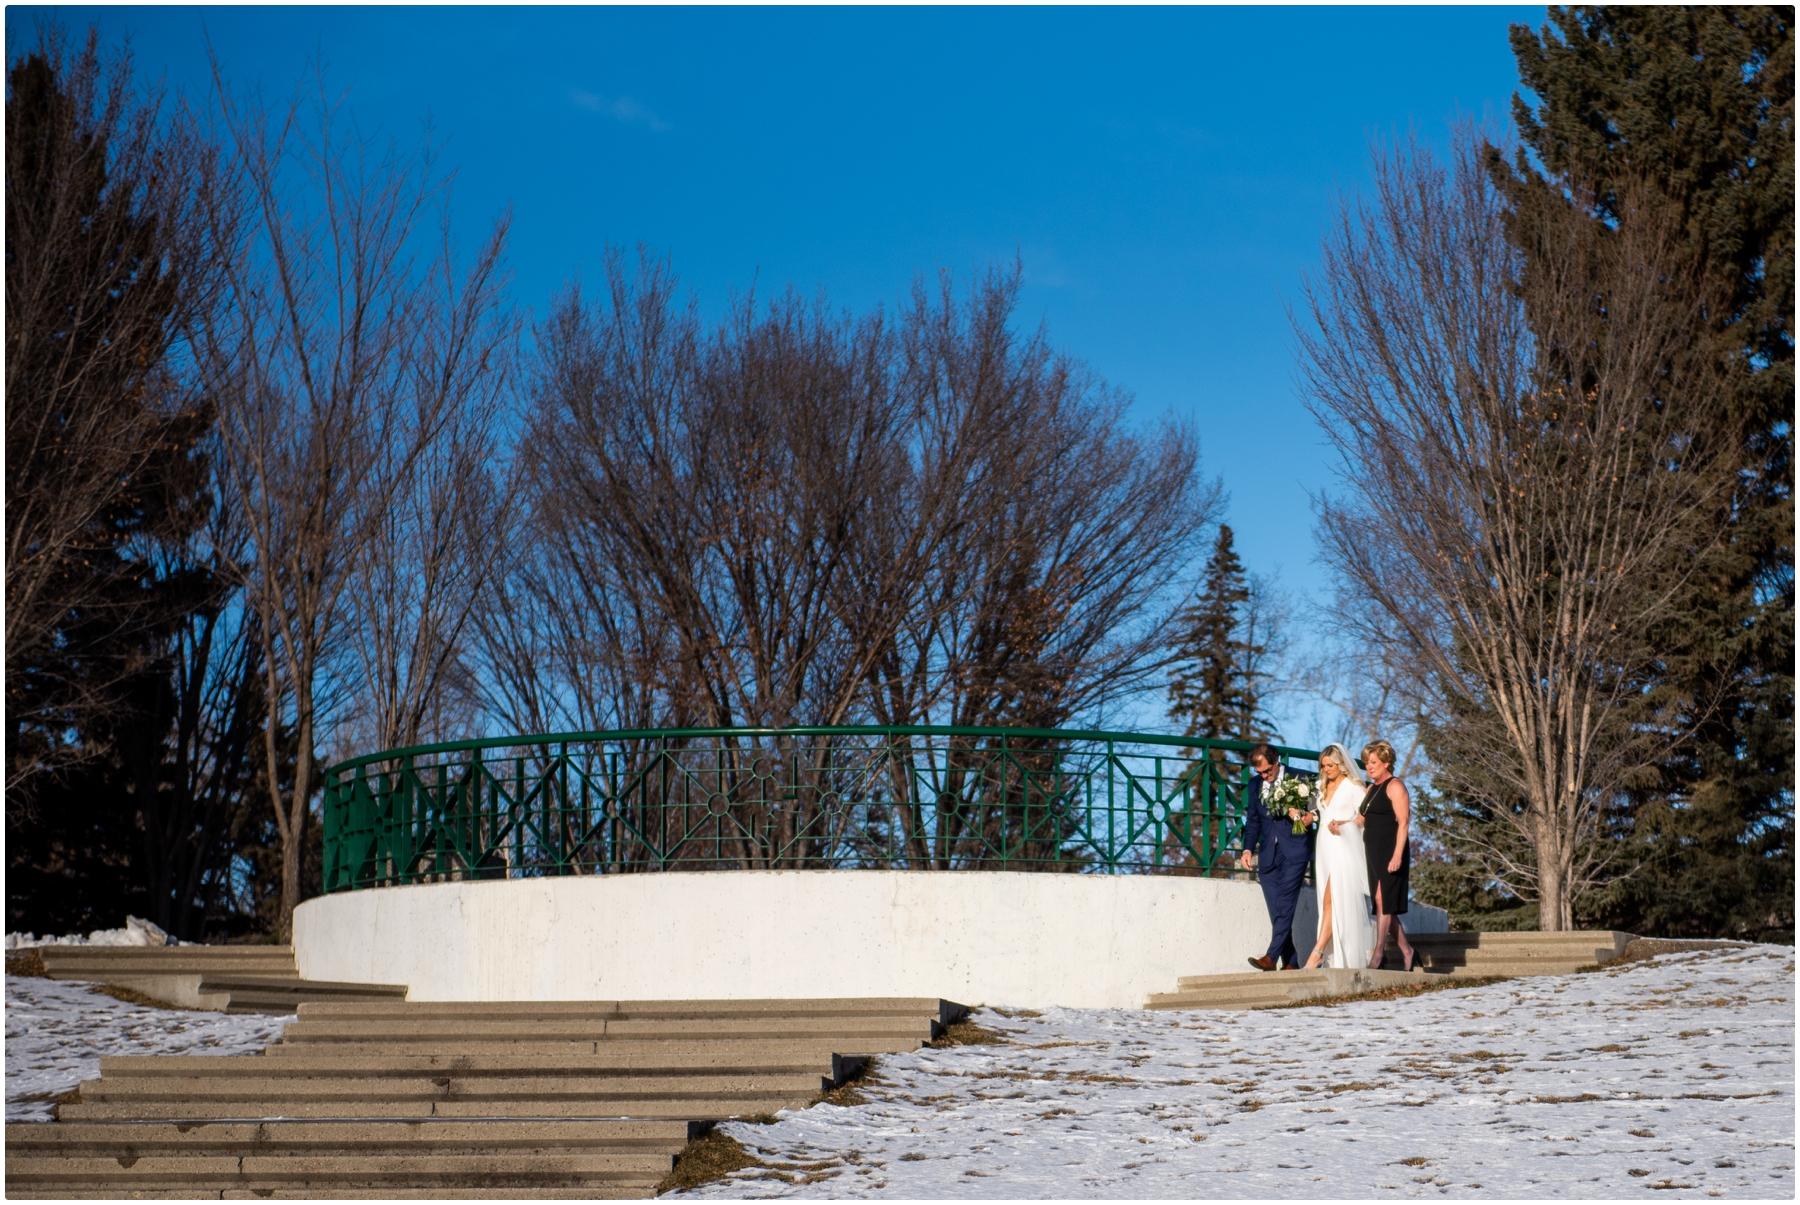 Calgary Winter Wedding Photographer - Baker Park